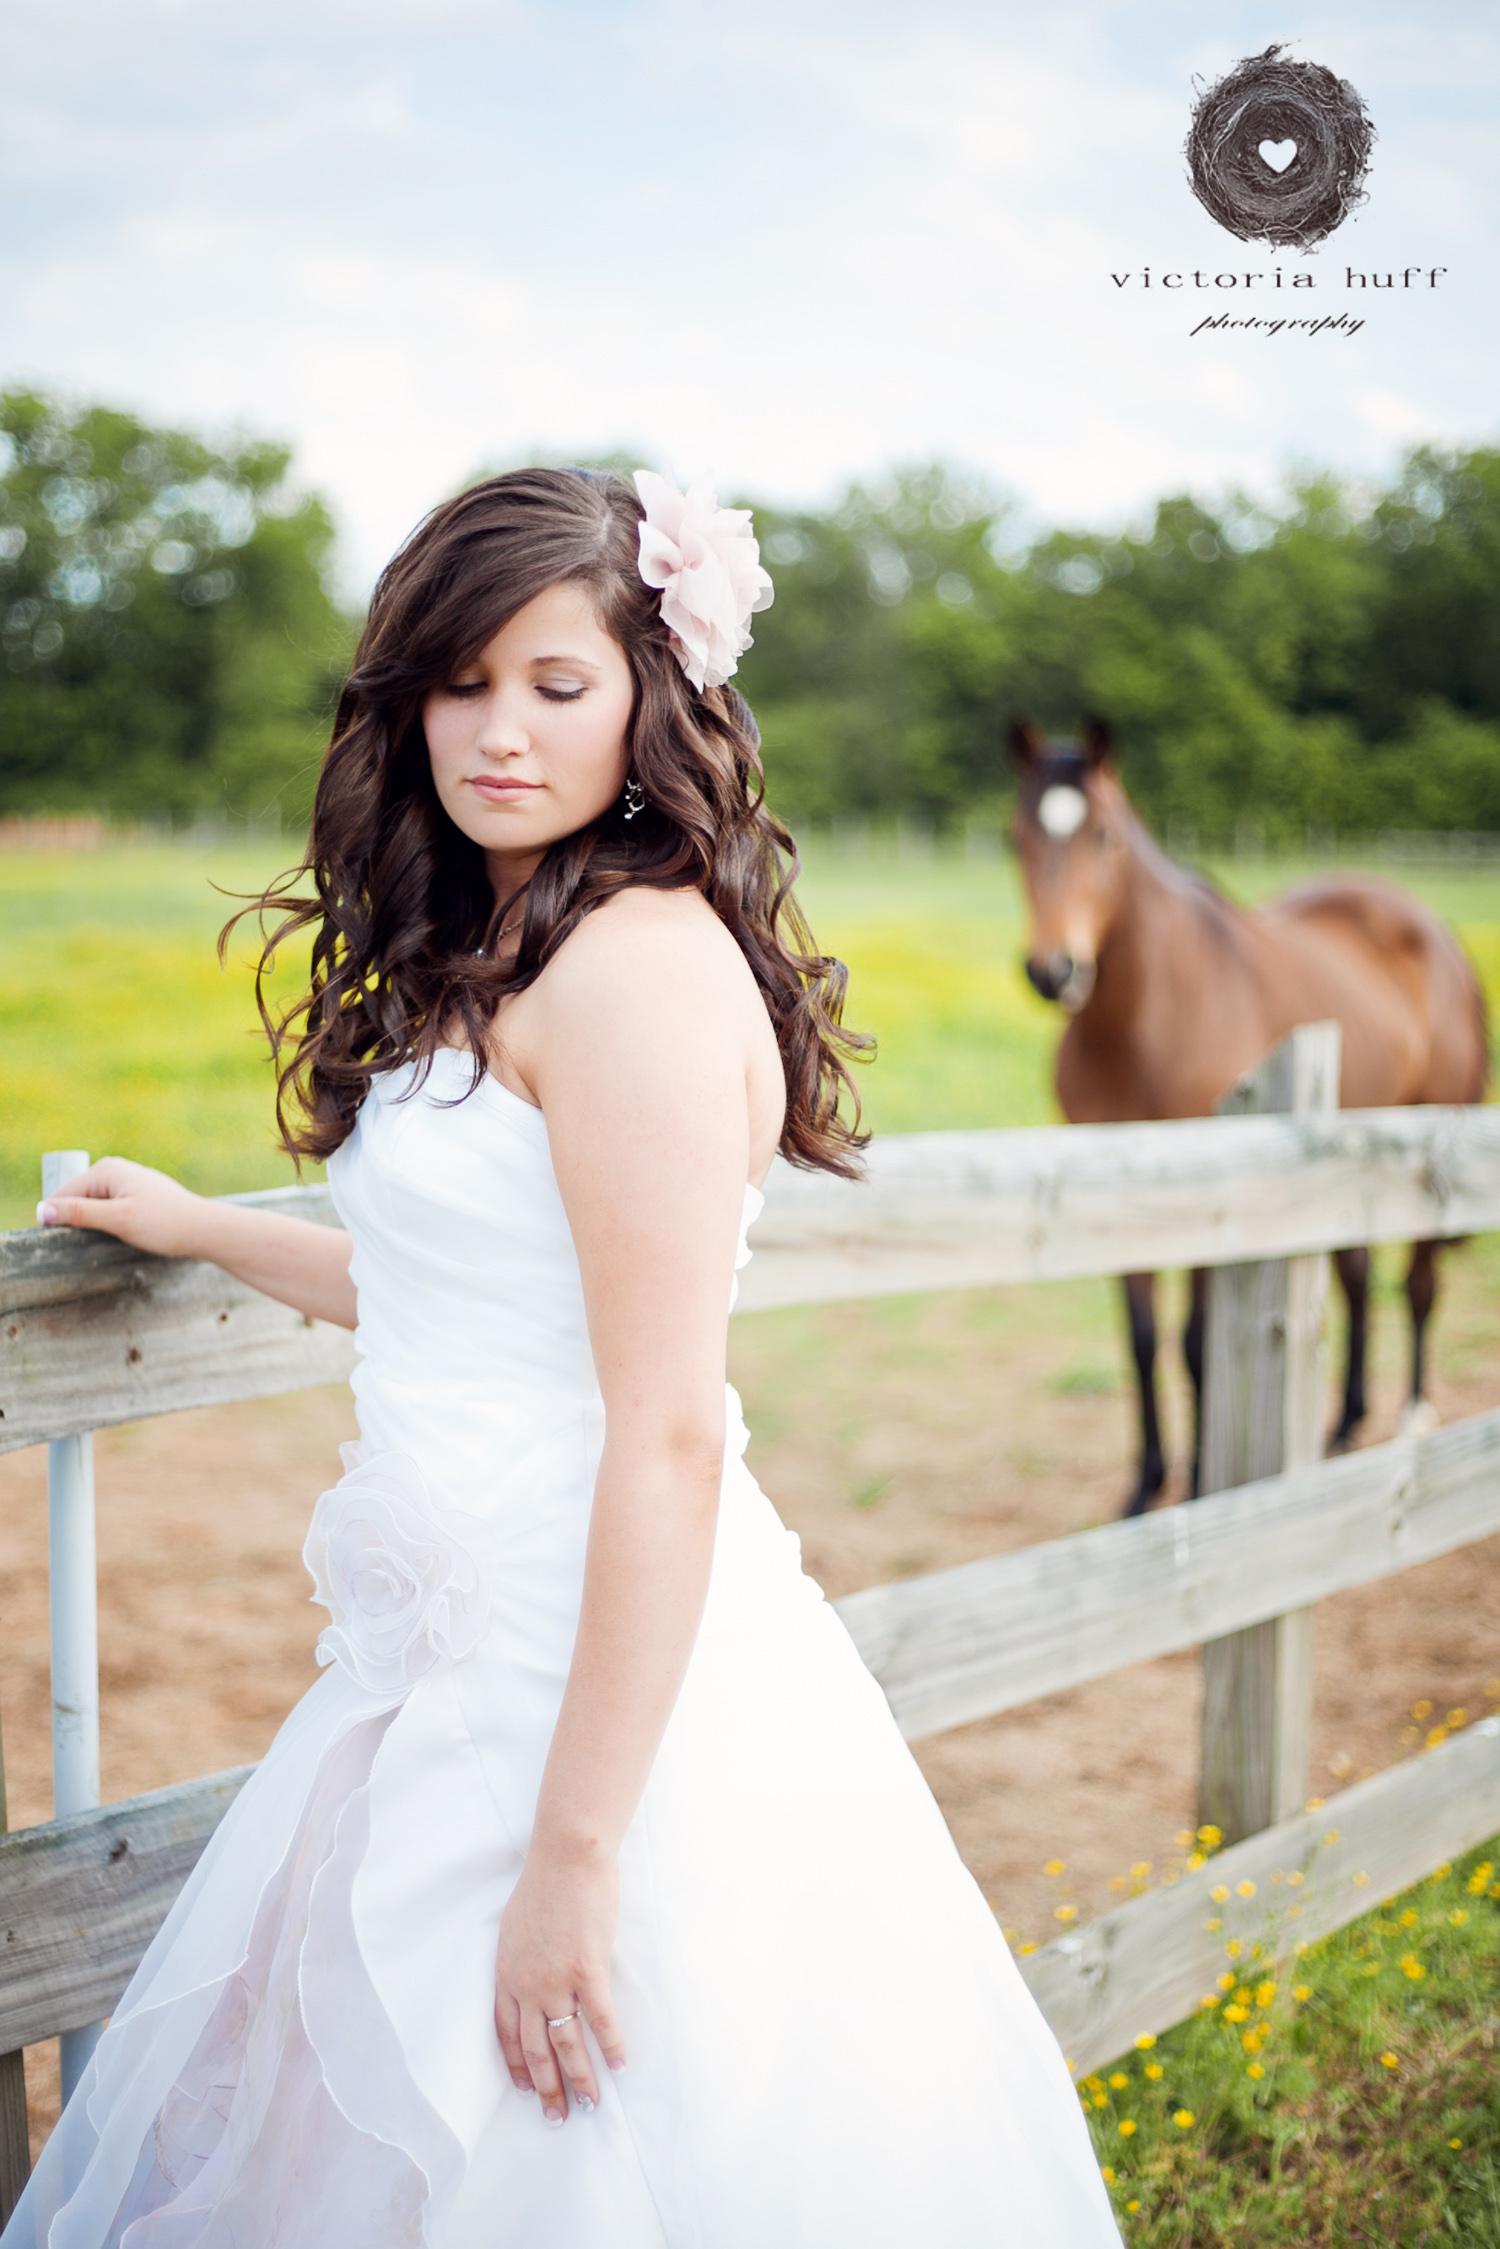 Wedding-Photography-Joshua-King-Natalie-Faith-outdoor-spring-barn-Wedding-bride-horse-Manchester-Tennessee.jpg